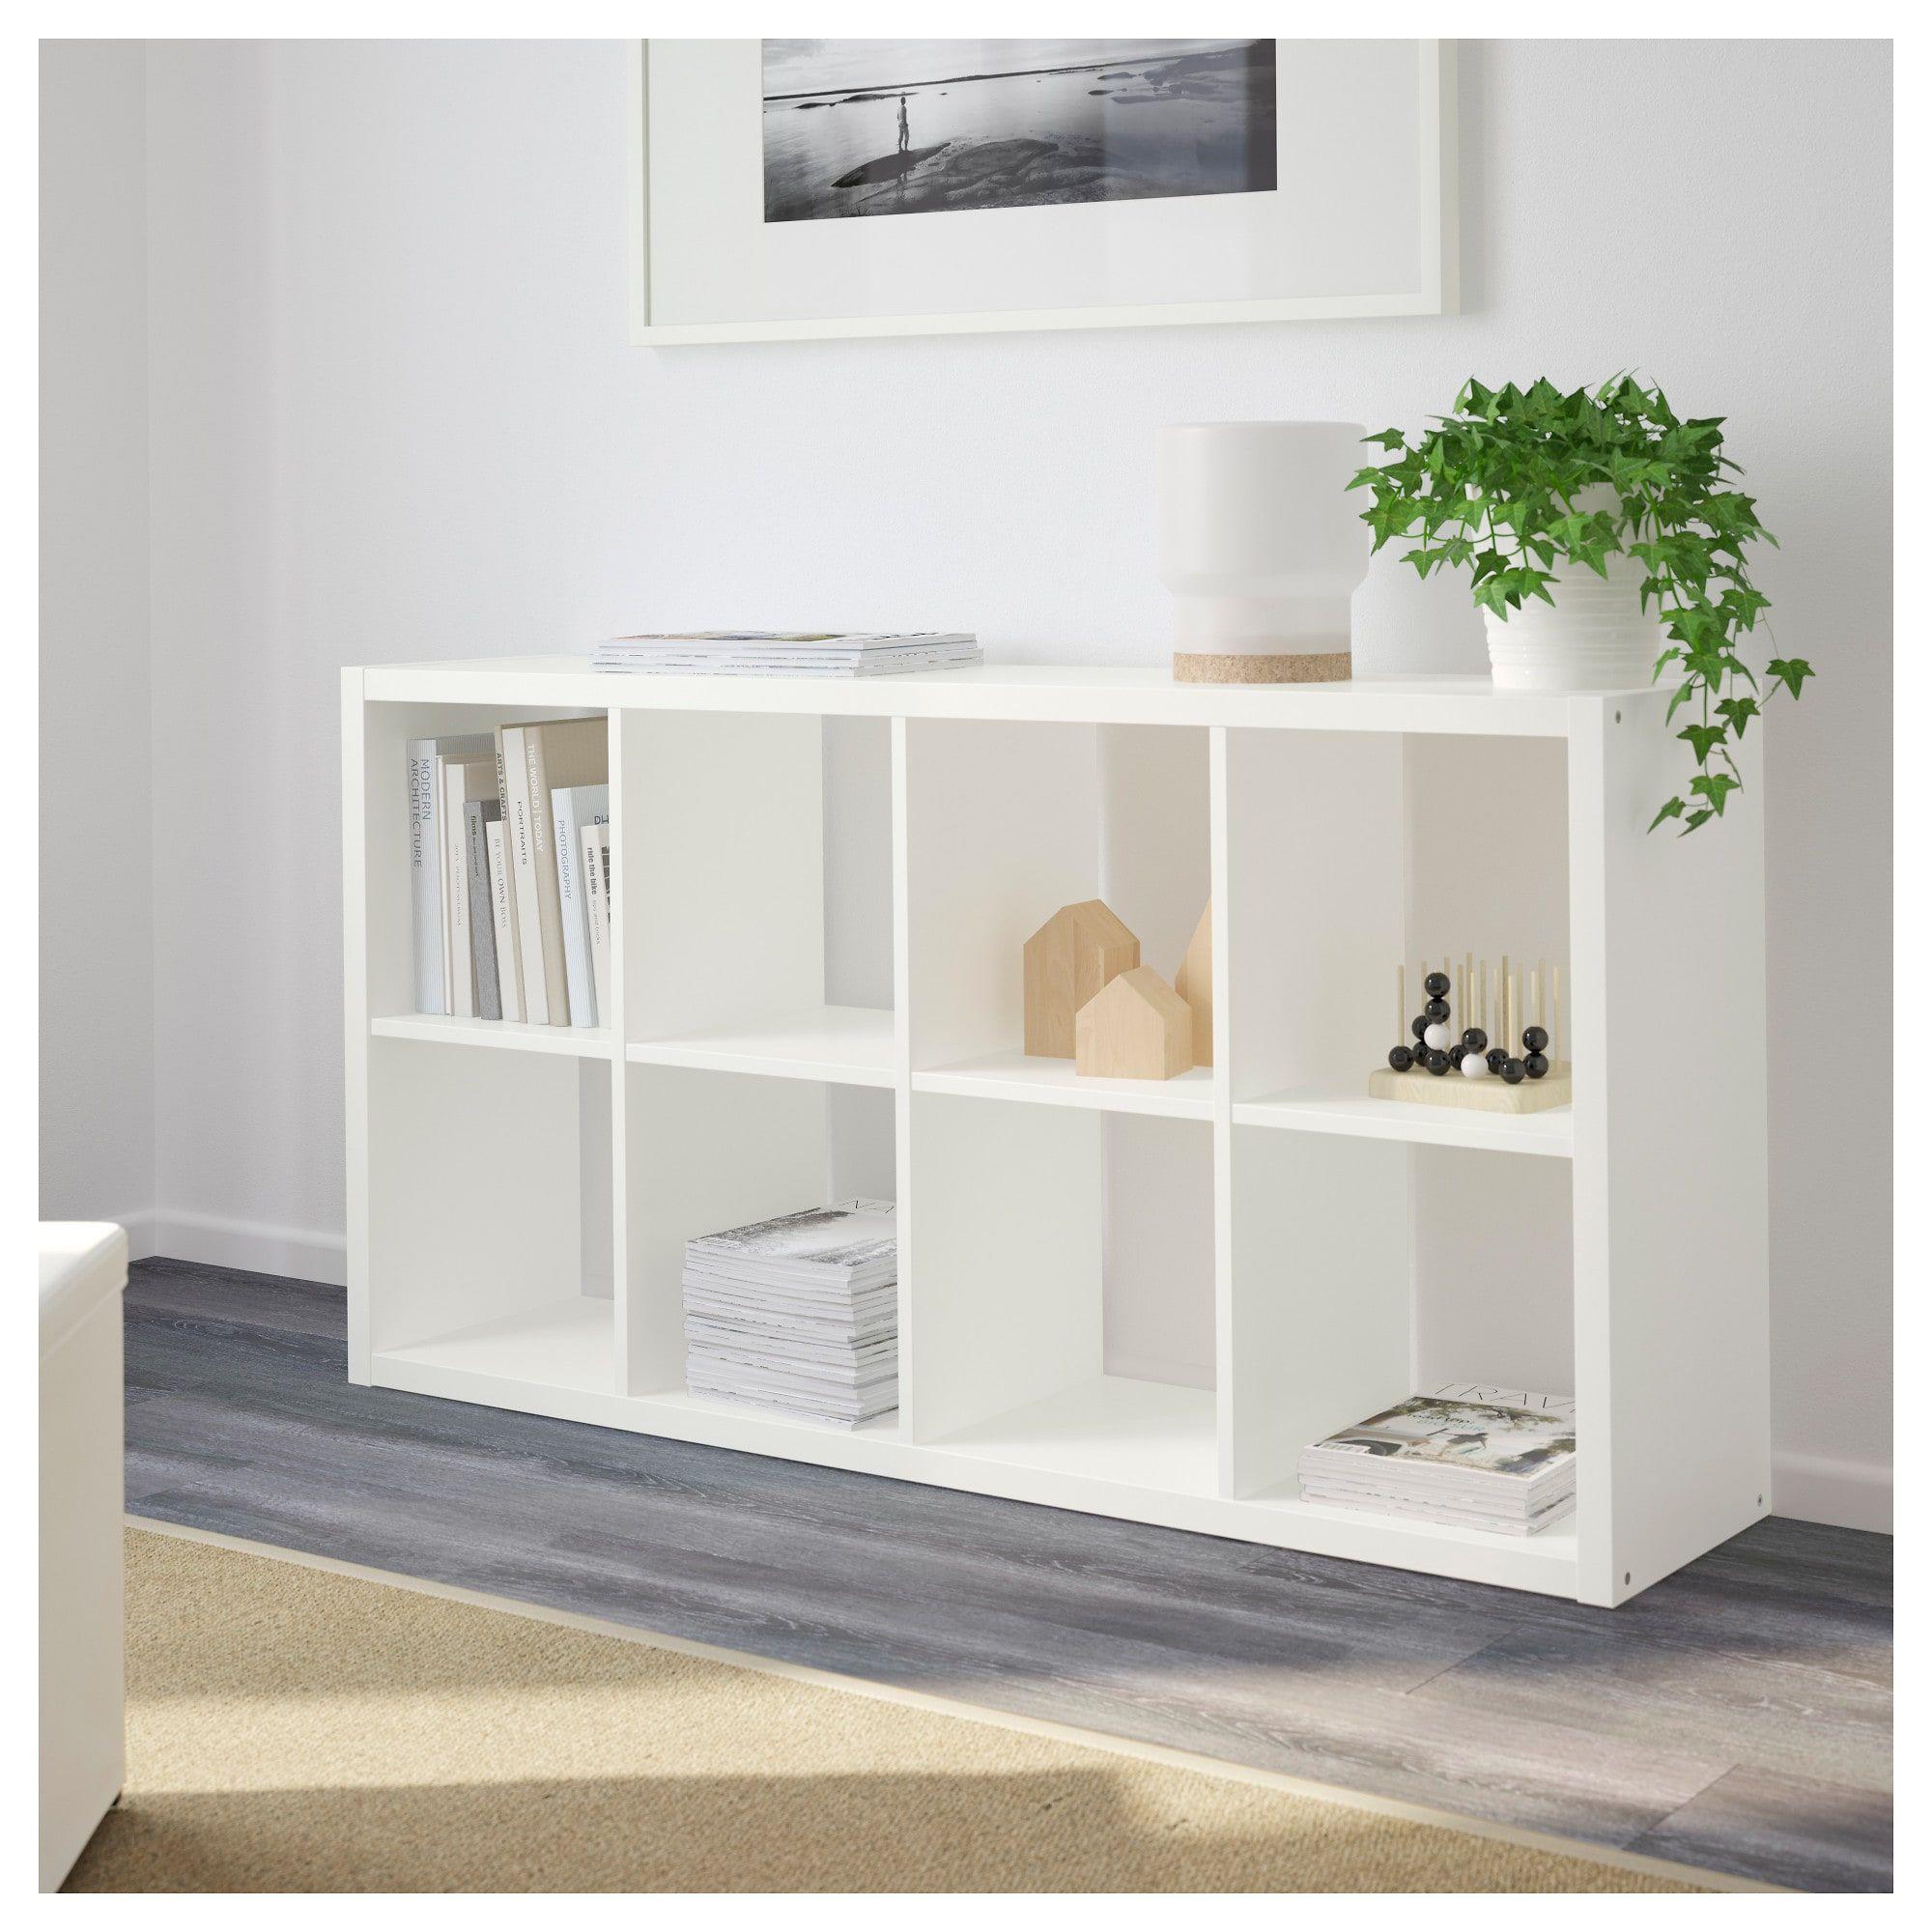 Flysta White Shelving Unit Ikea Ikea Shelving Unit Shelving Unit Shelves